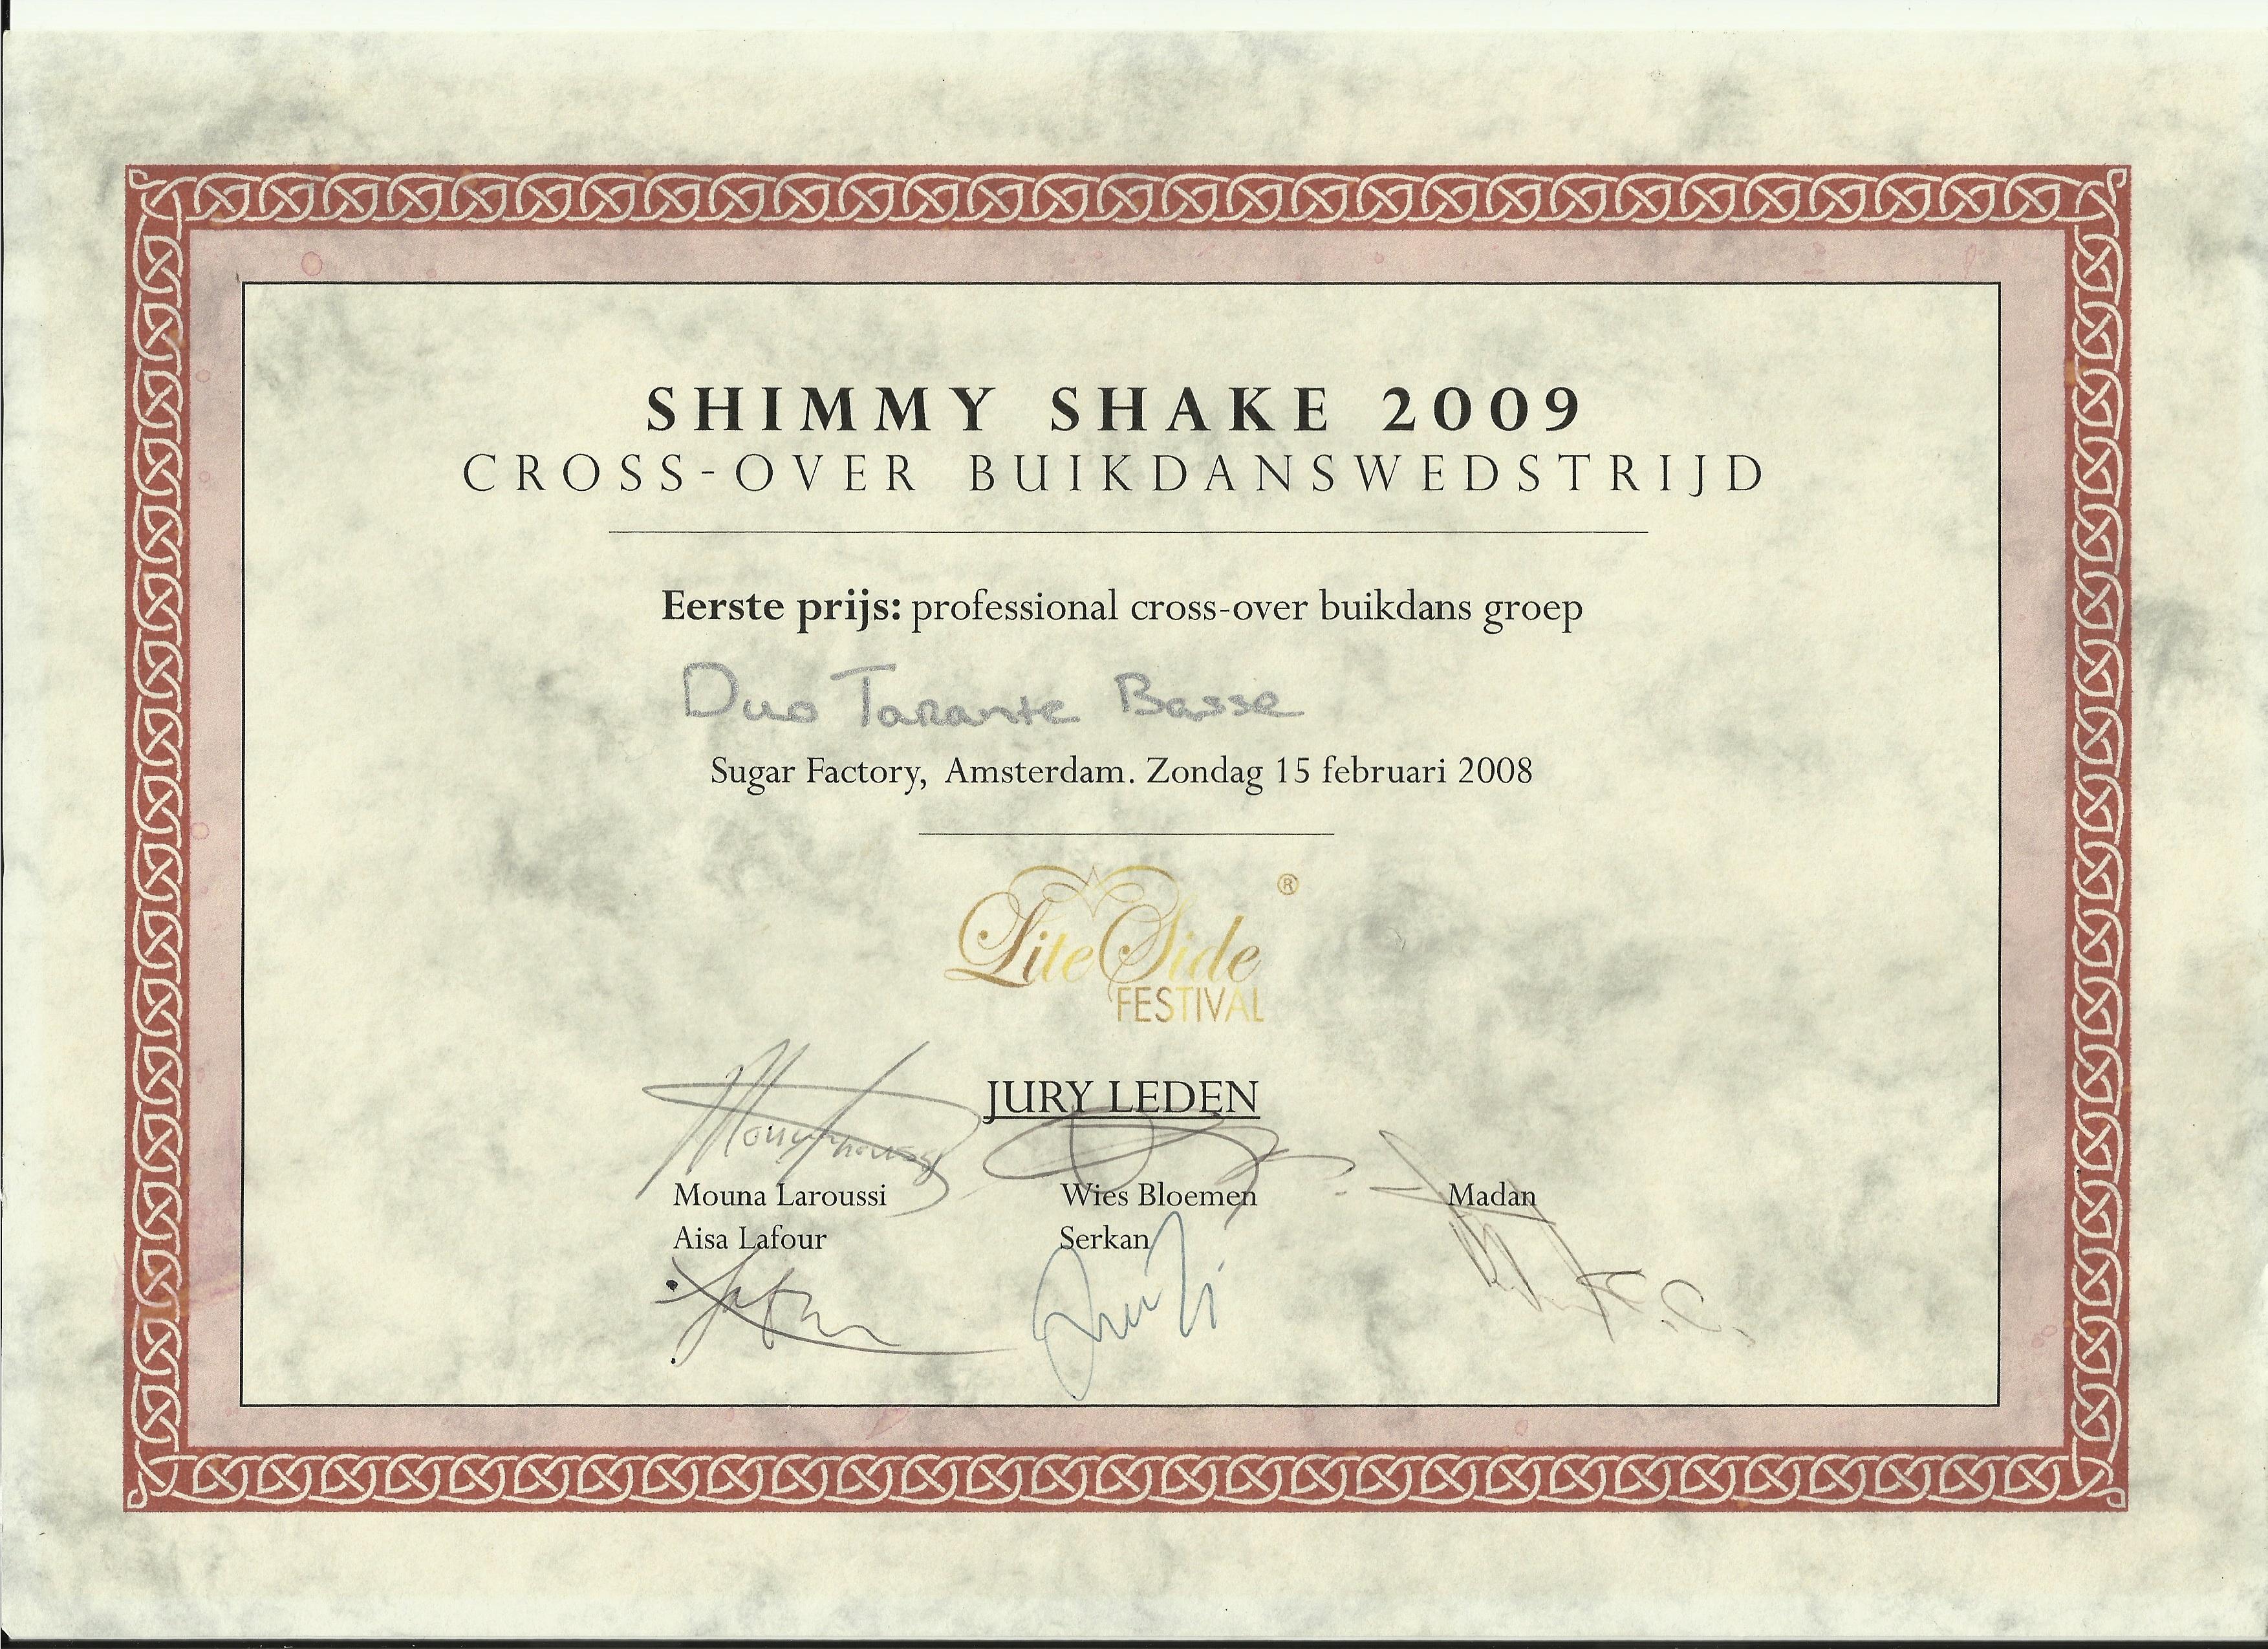 shymmy-shake-frist prize DUo Tarante Basse